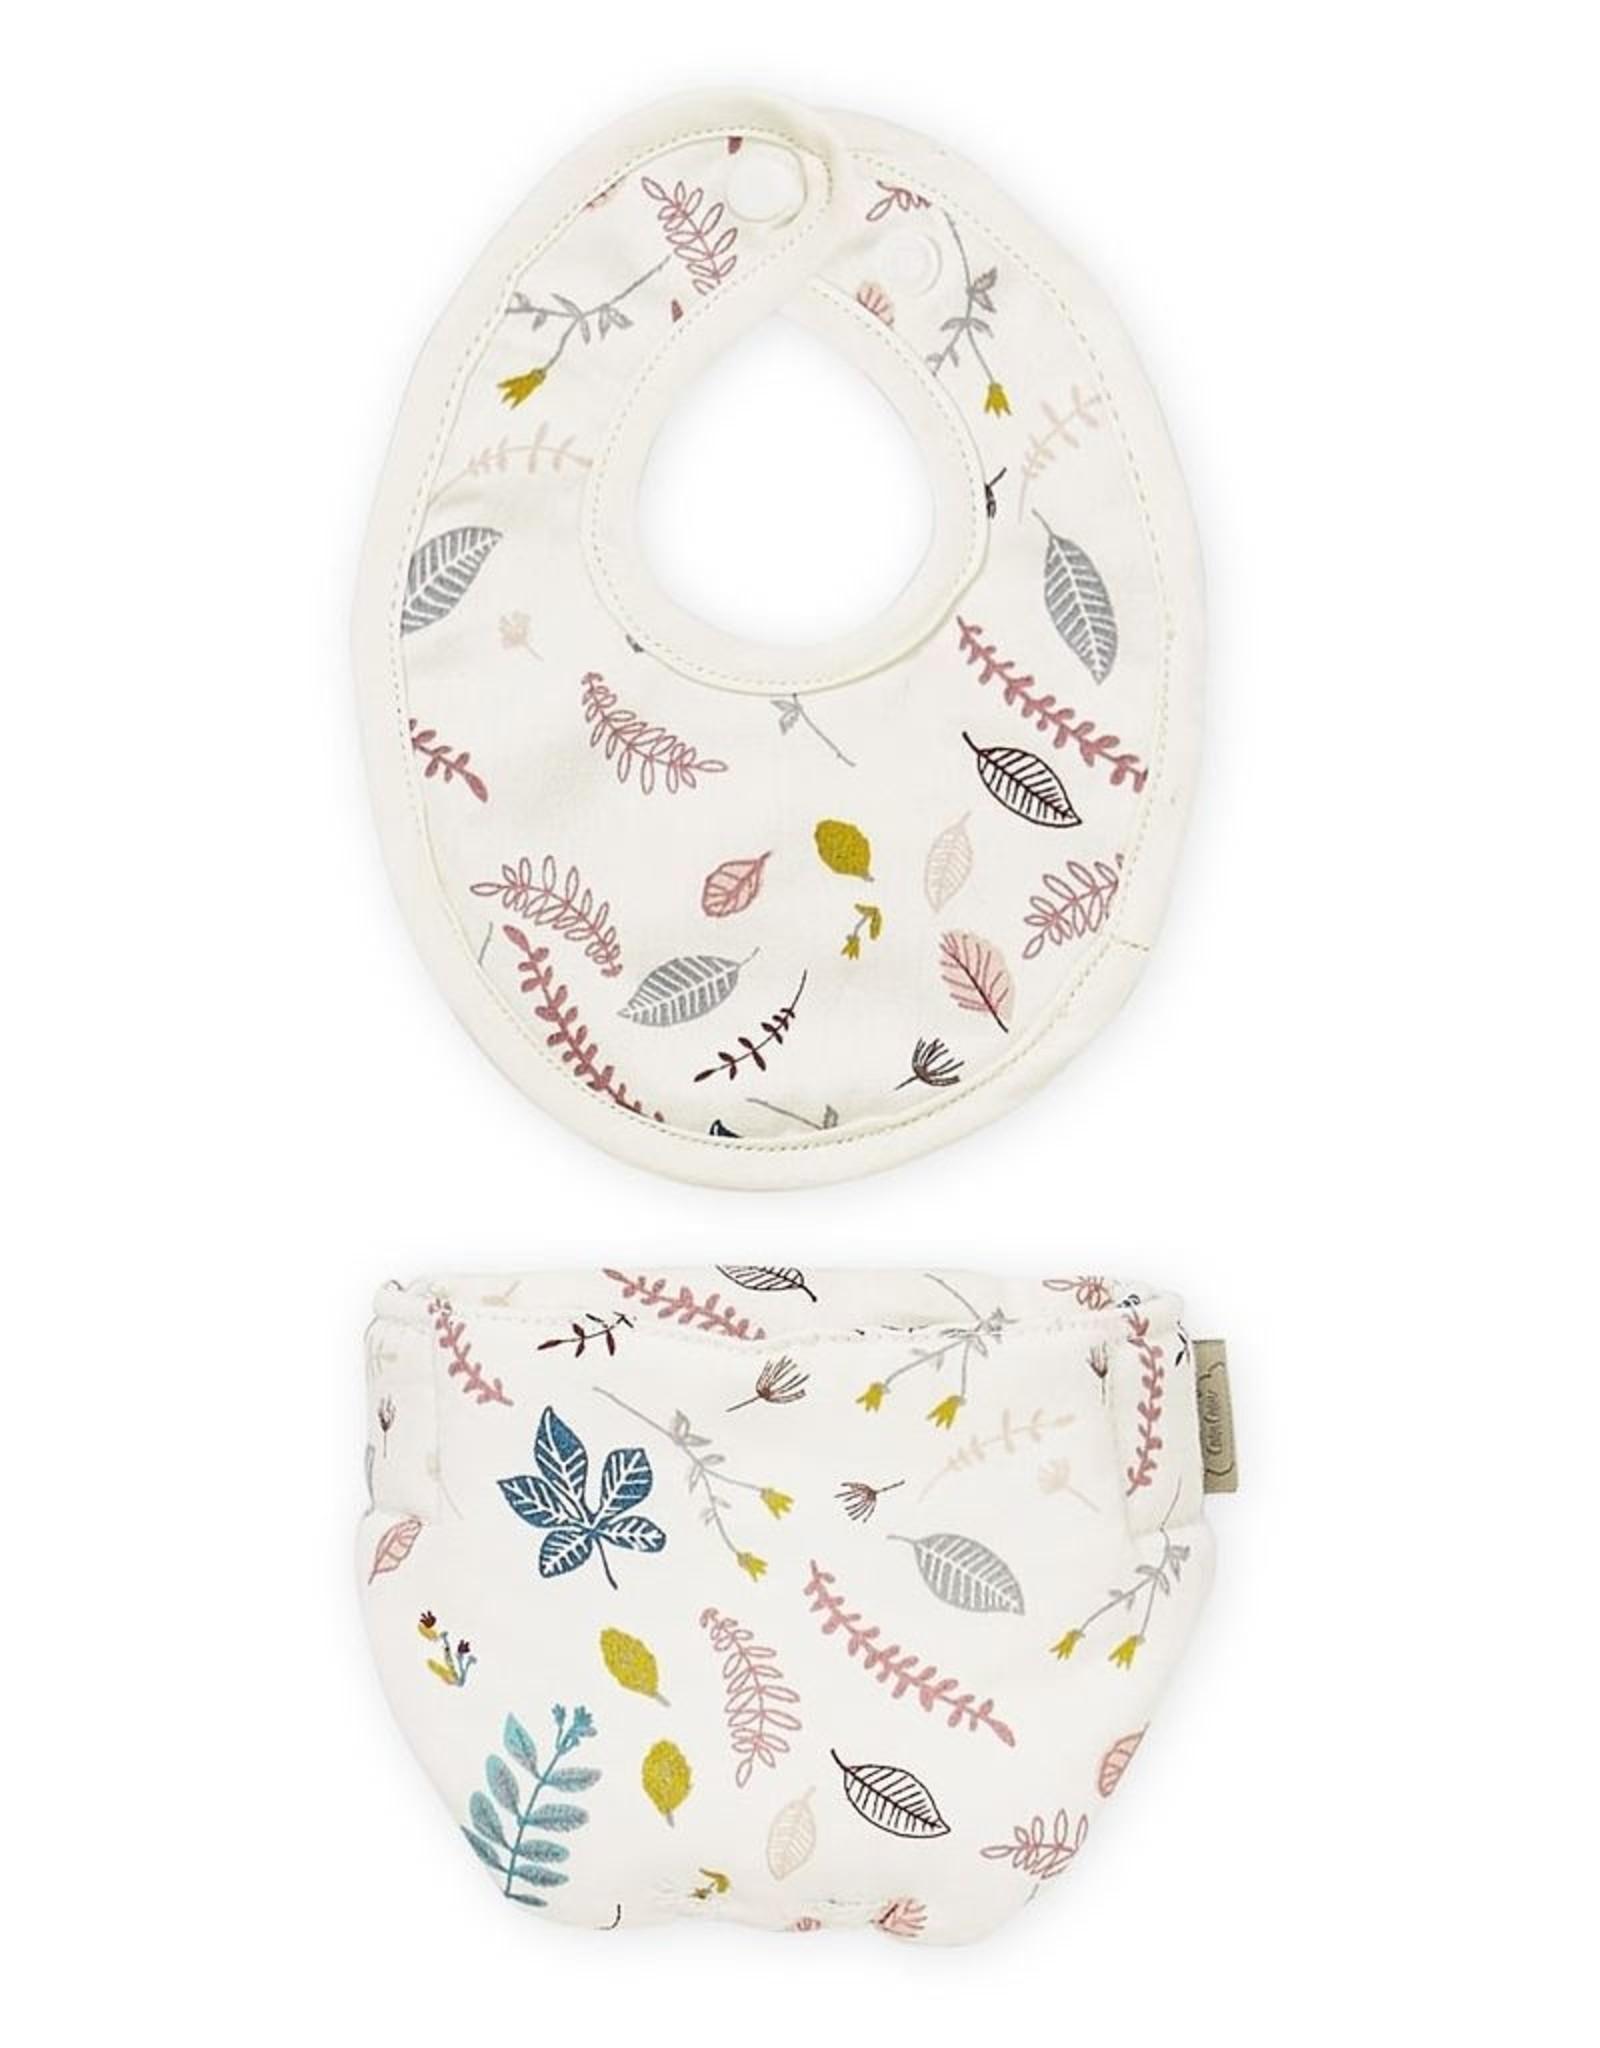 Cam Cam Cam Cam - Bib and Diaper Set  Pressed Leaves